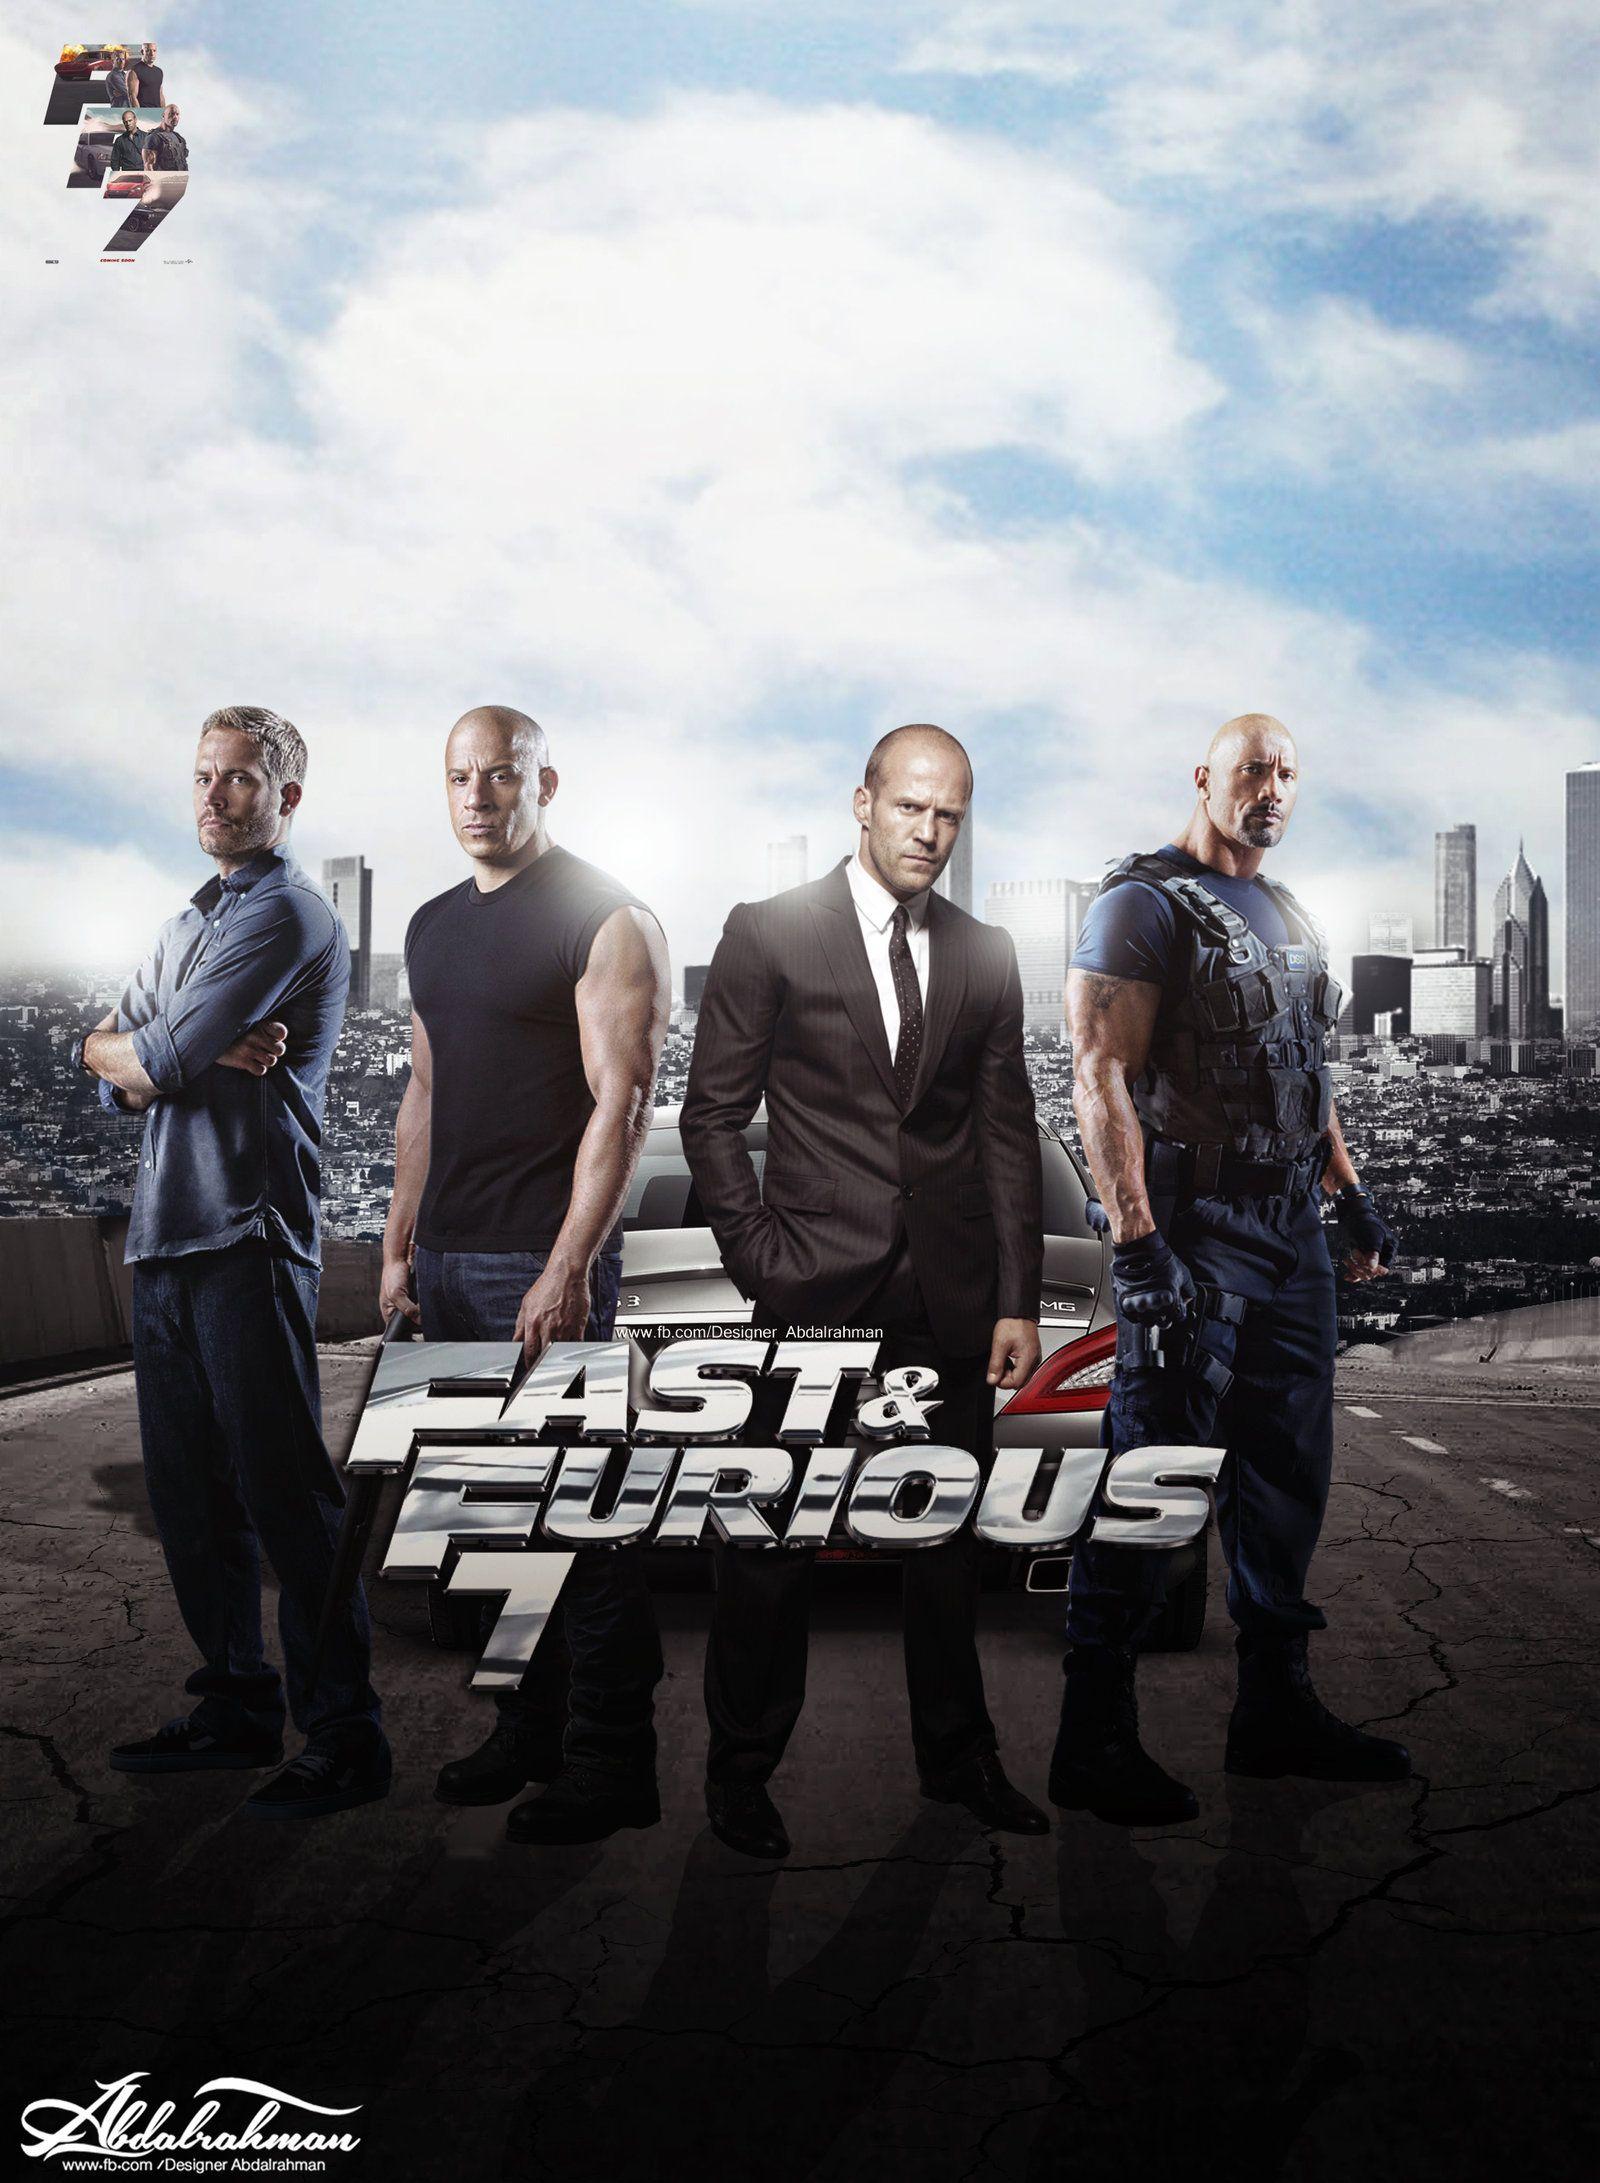 Fast Furious 7 Fast And Furious Furious Movie Furious 7 Movie